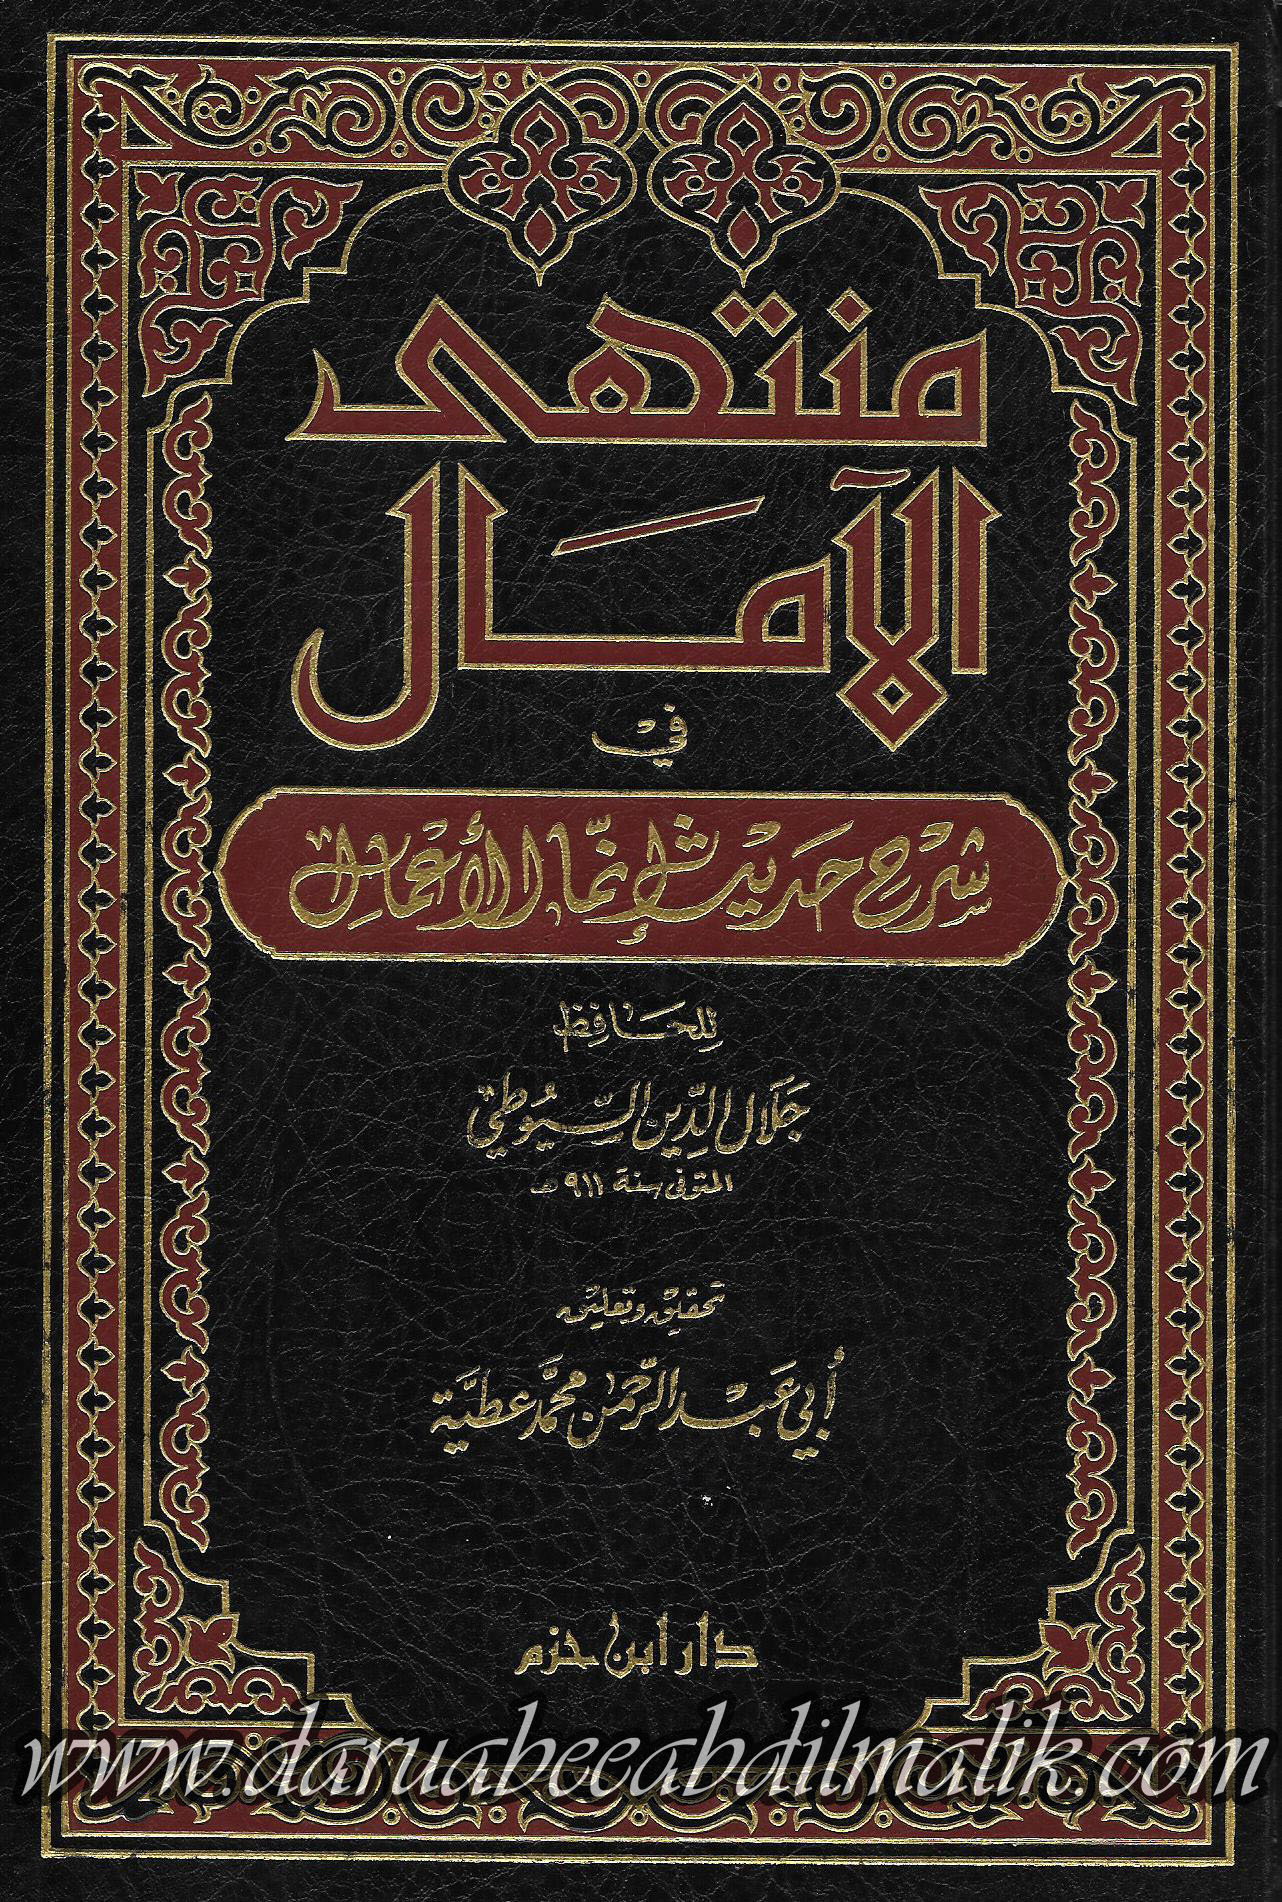 al-Muntaha al-Amal منتهى الآمال في شرح حديث إنما الأعمال